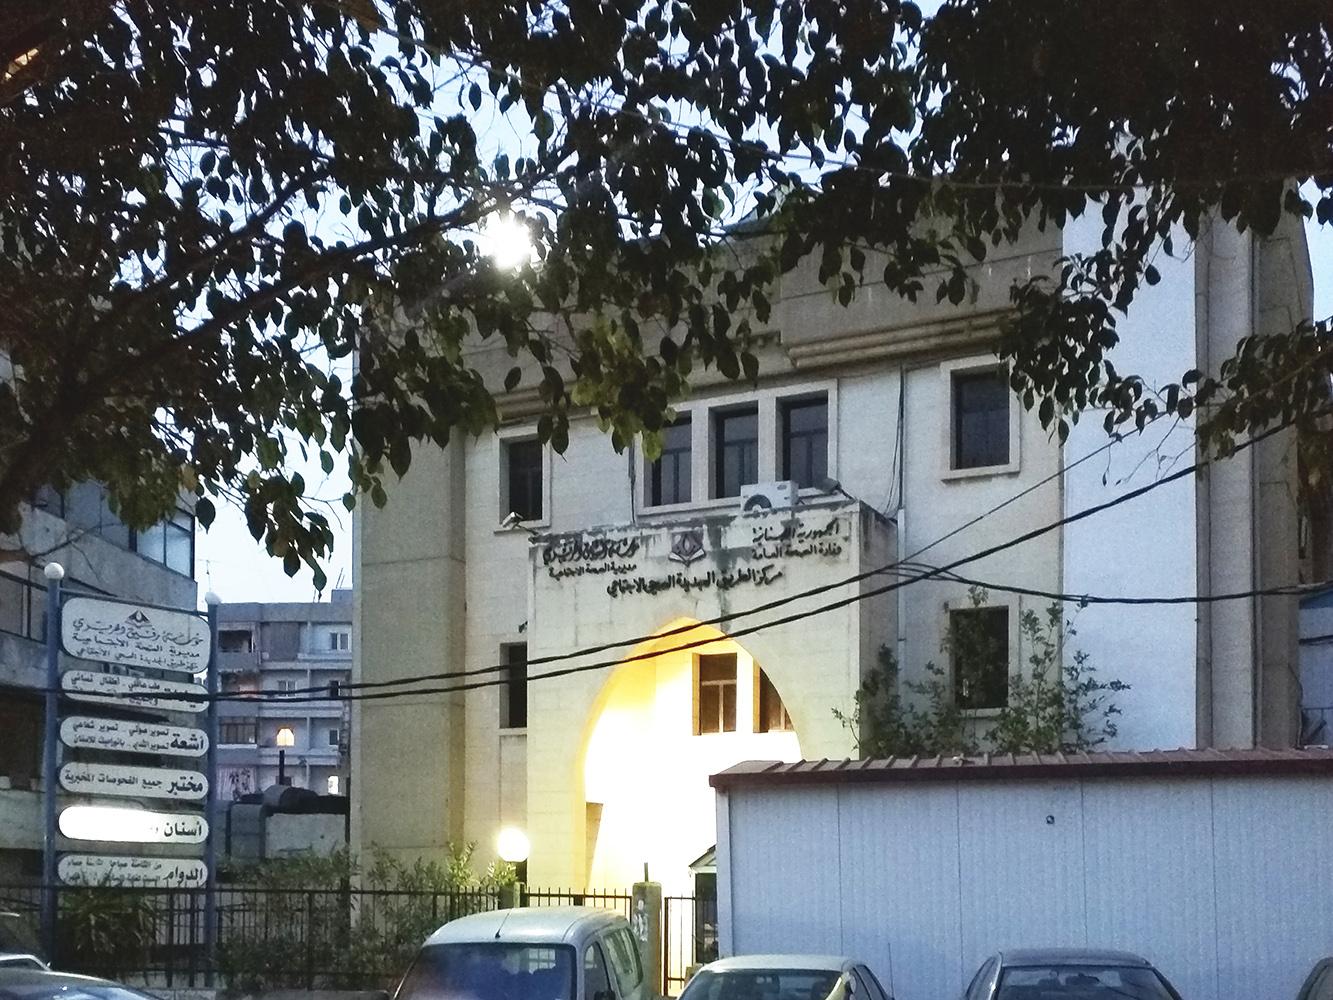 Left: Building of former Hariri Health Foundation center in Ras el-Nabaa Right: Hariri Health Foundation center in Tariq el-Jdide